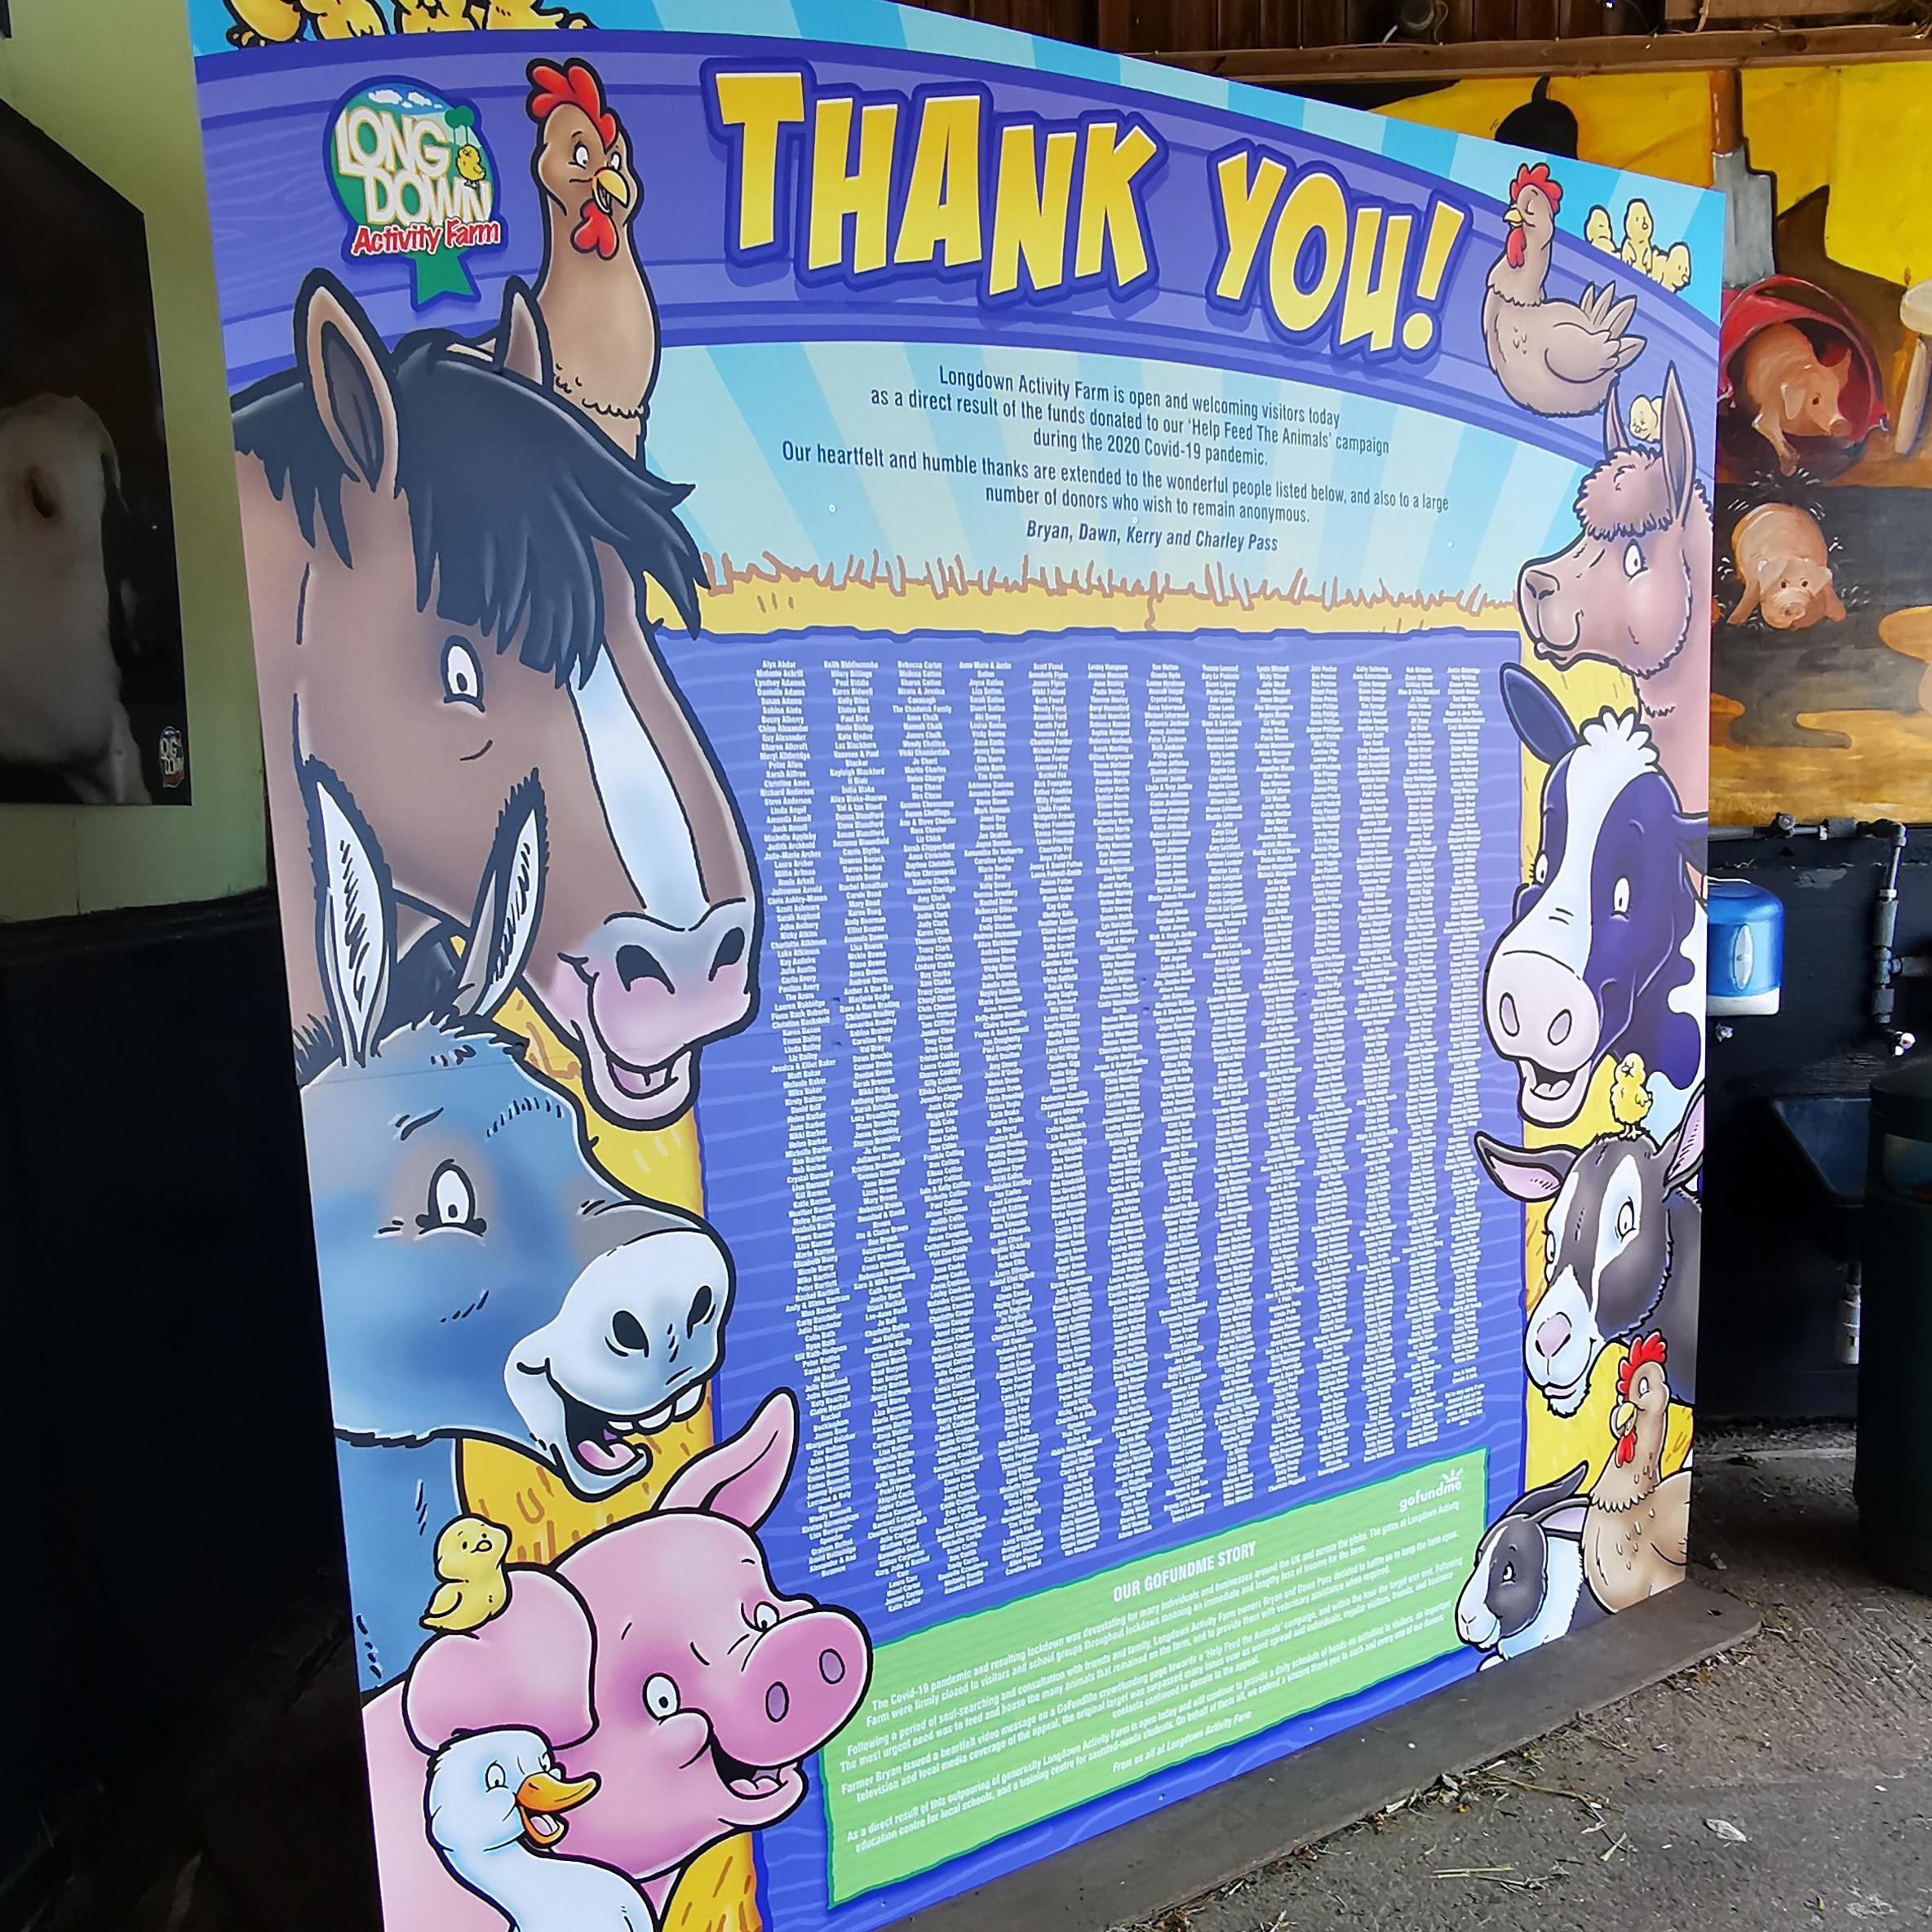 The Thank You Board at Longdown Activity Farm